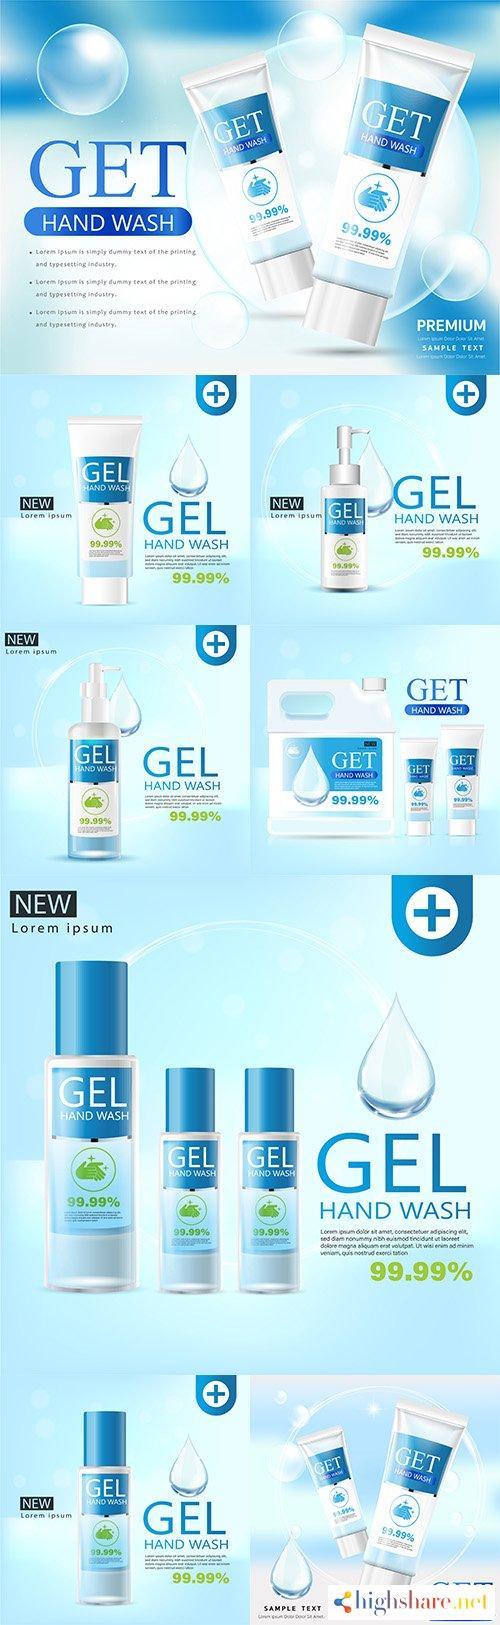 medical hand washing gel clear bottle 3d illustration 5f3fec38dcf3b - Medical hand washing gel, clear bottle 3d illustration